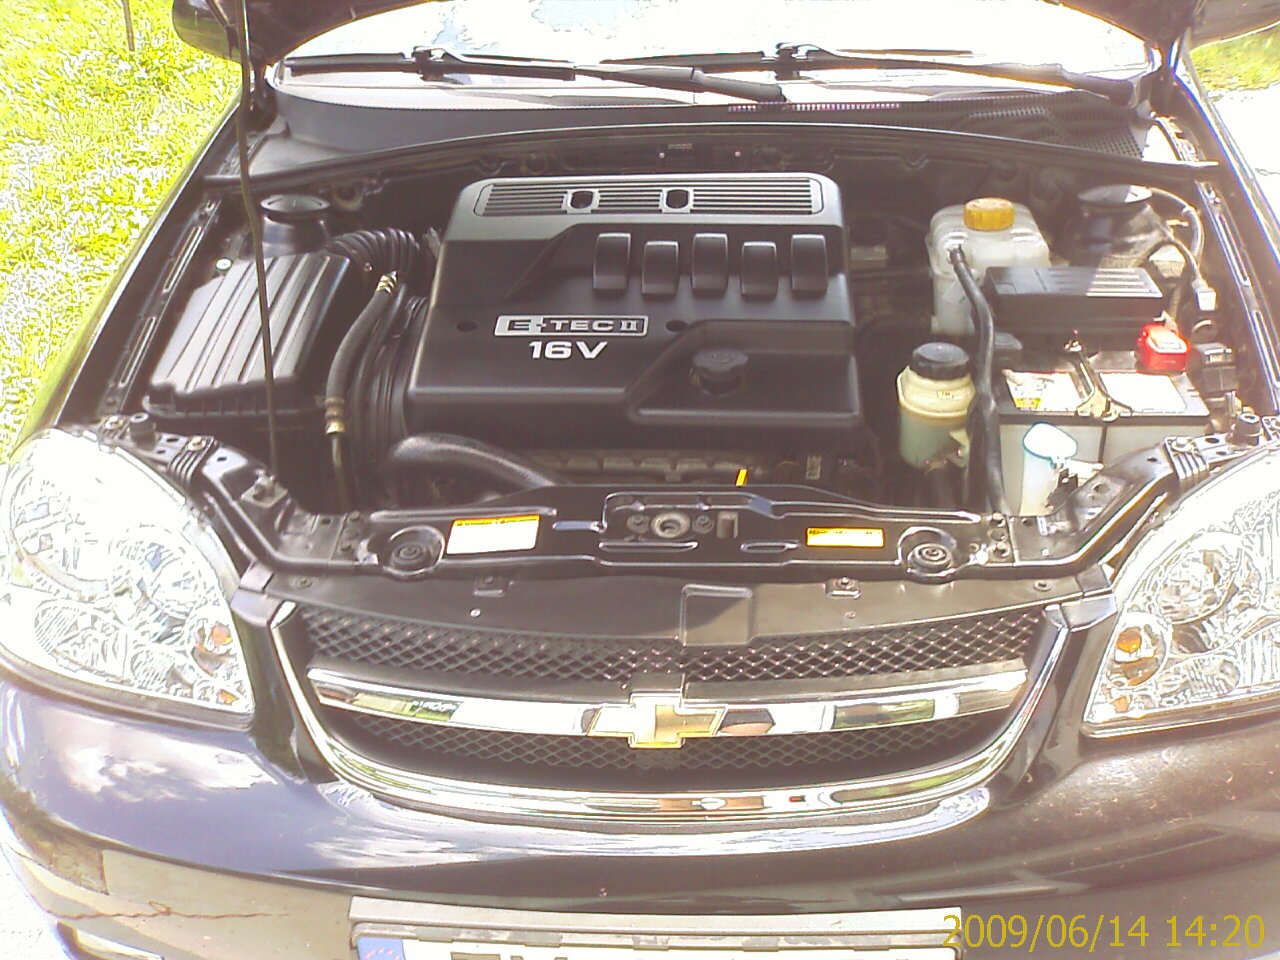 Vind sau schimb Chevrolet lacetti 1.6 an 2006